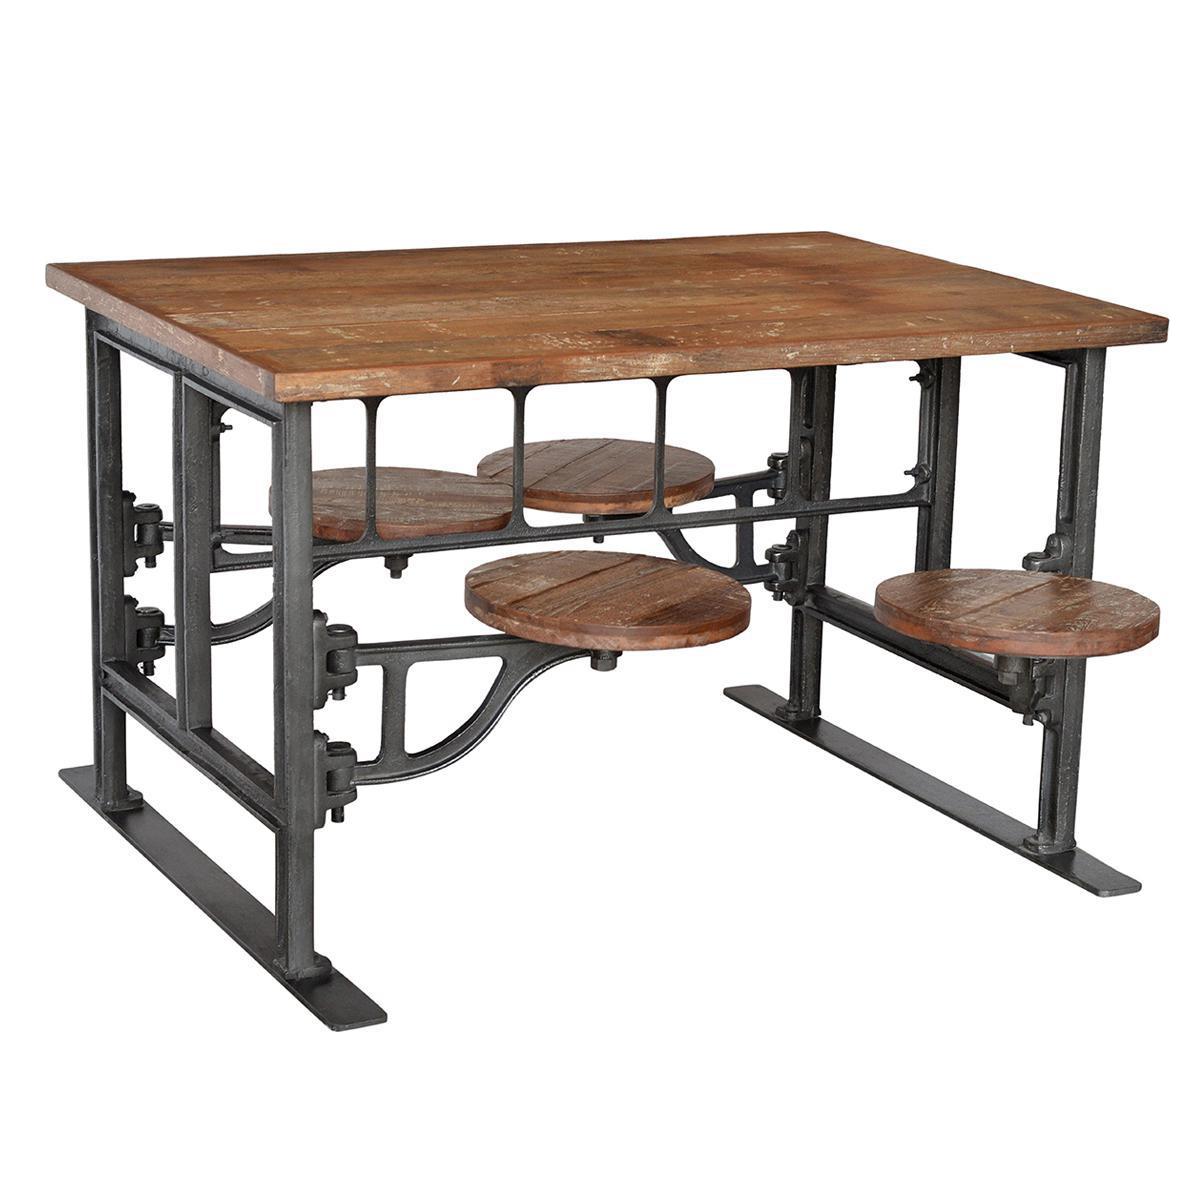 Rustic Reclaimed Wood amp Iron Table Stools Chairish